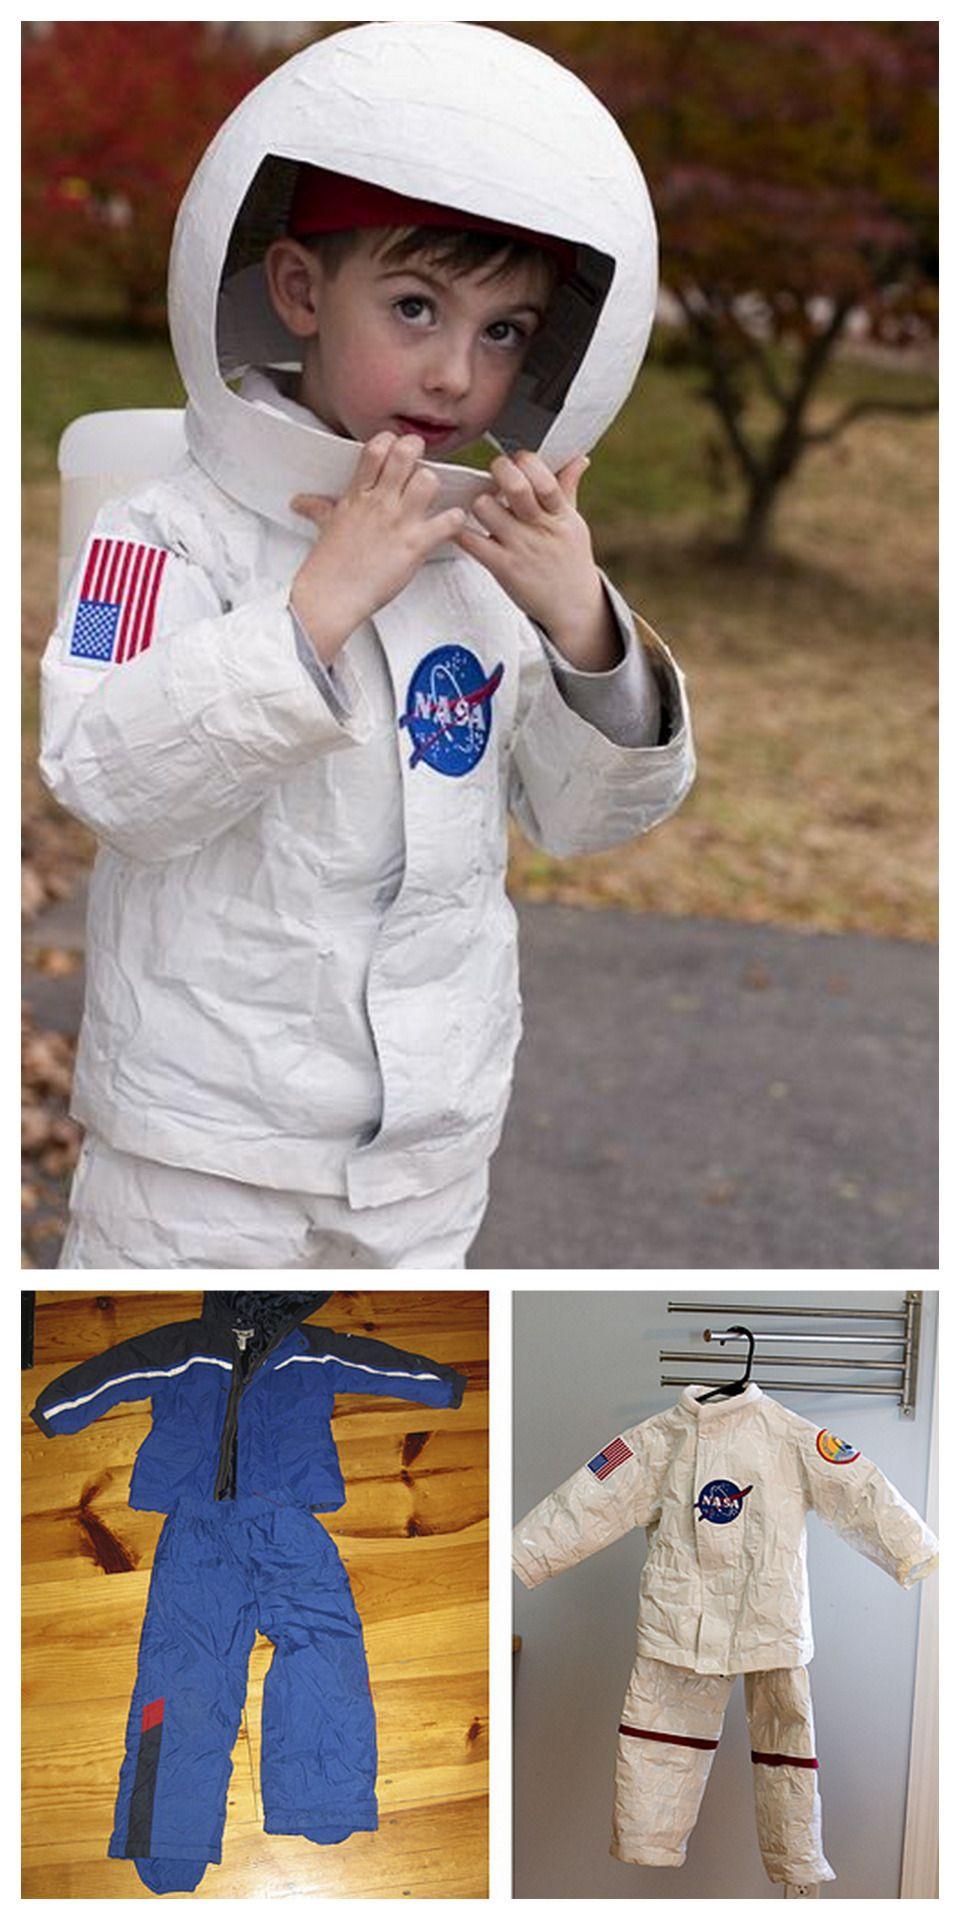 DIY Kids Astronaut Costume  DIY Astronaut Costume Tutorial from stitch craft it